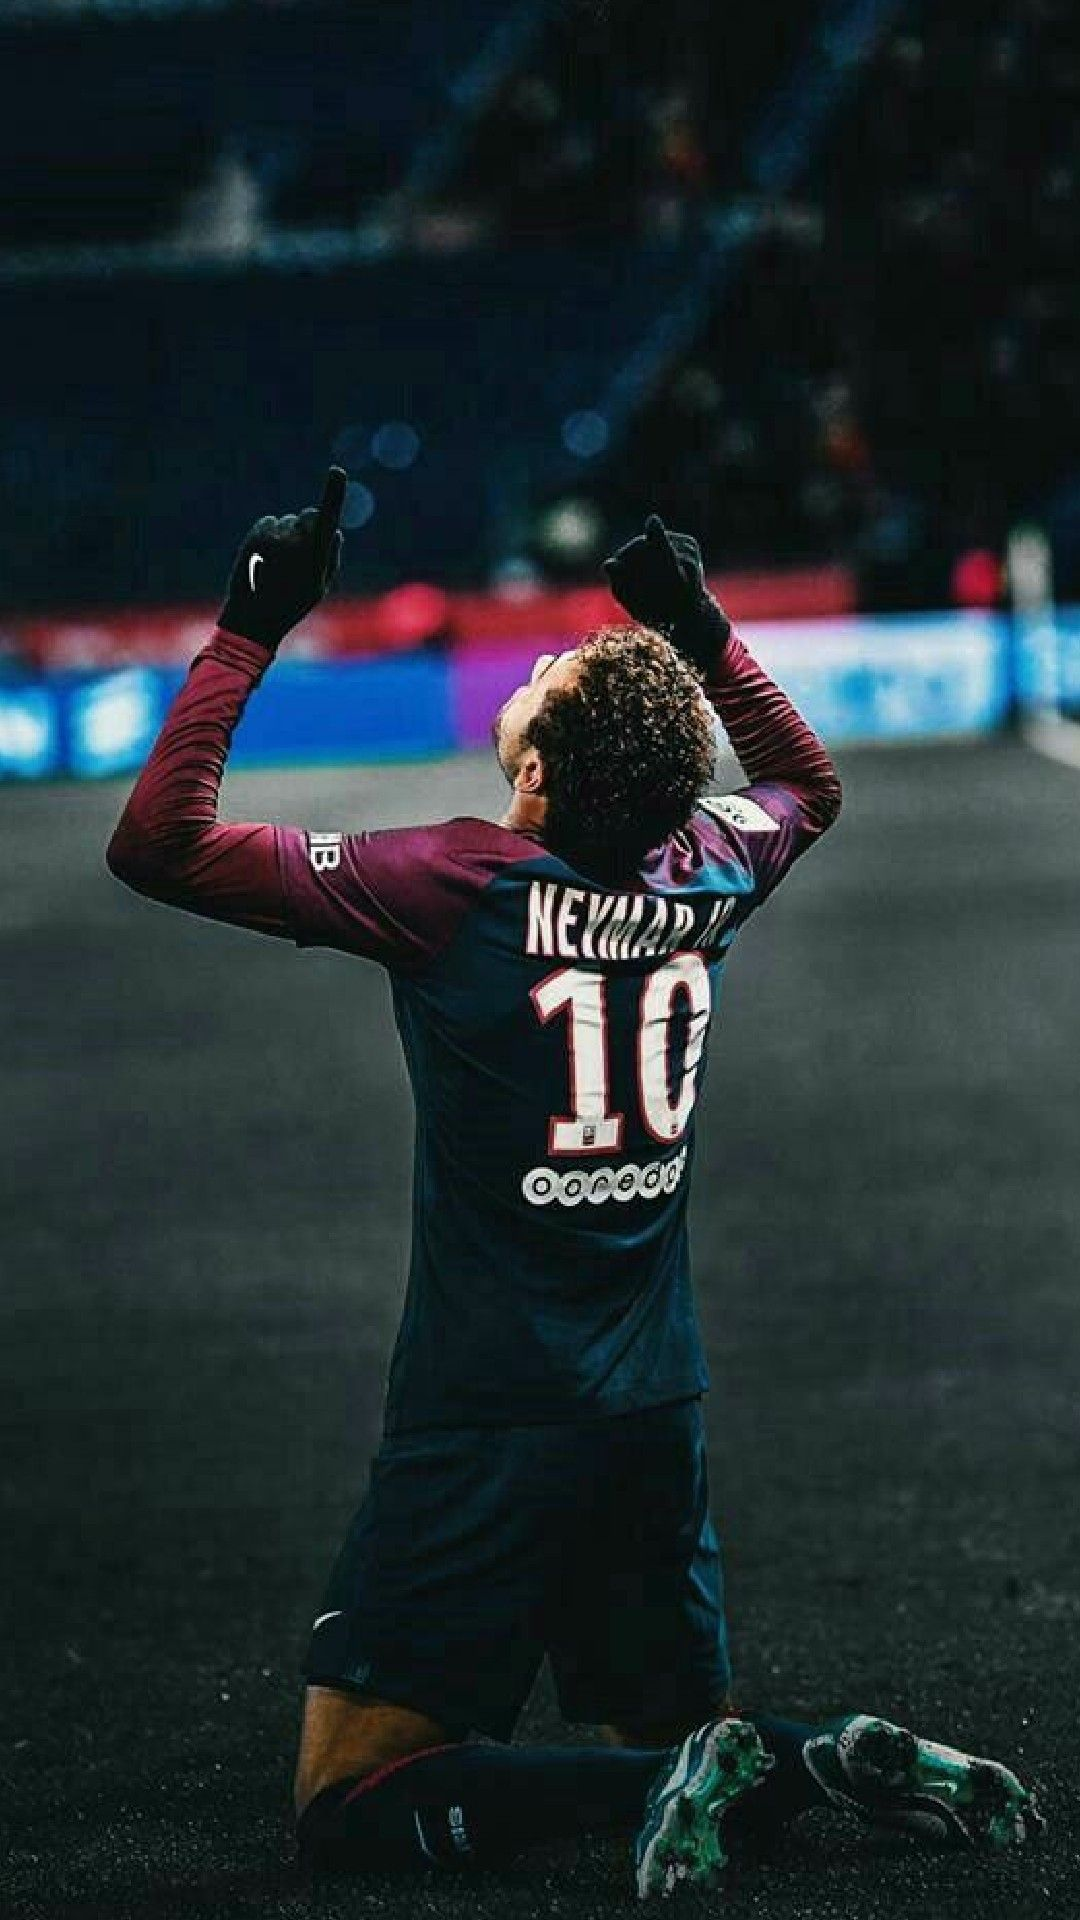 Neymar Jr 🇧🇷 imagens) Futebol neymar, Jogadores de